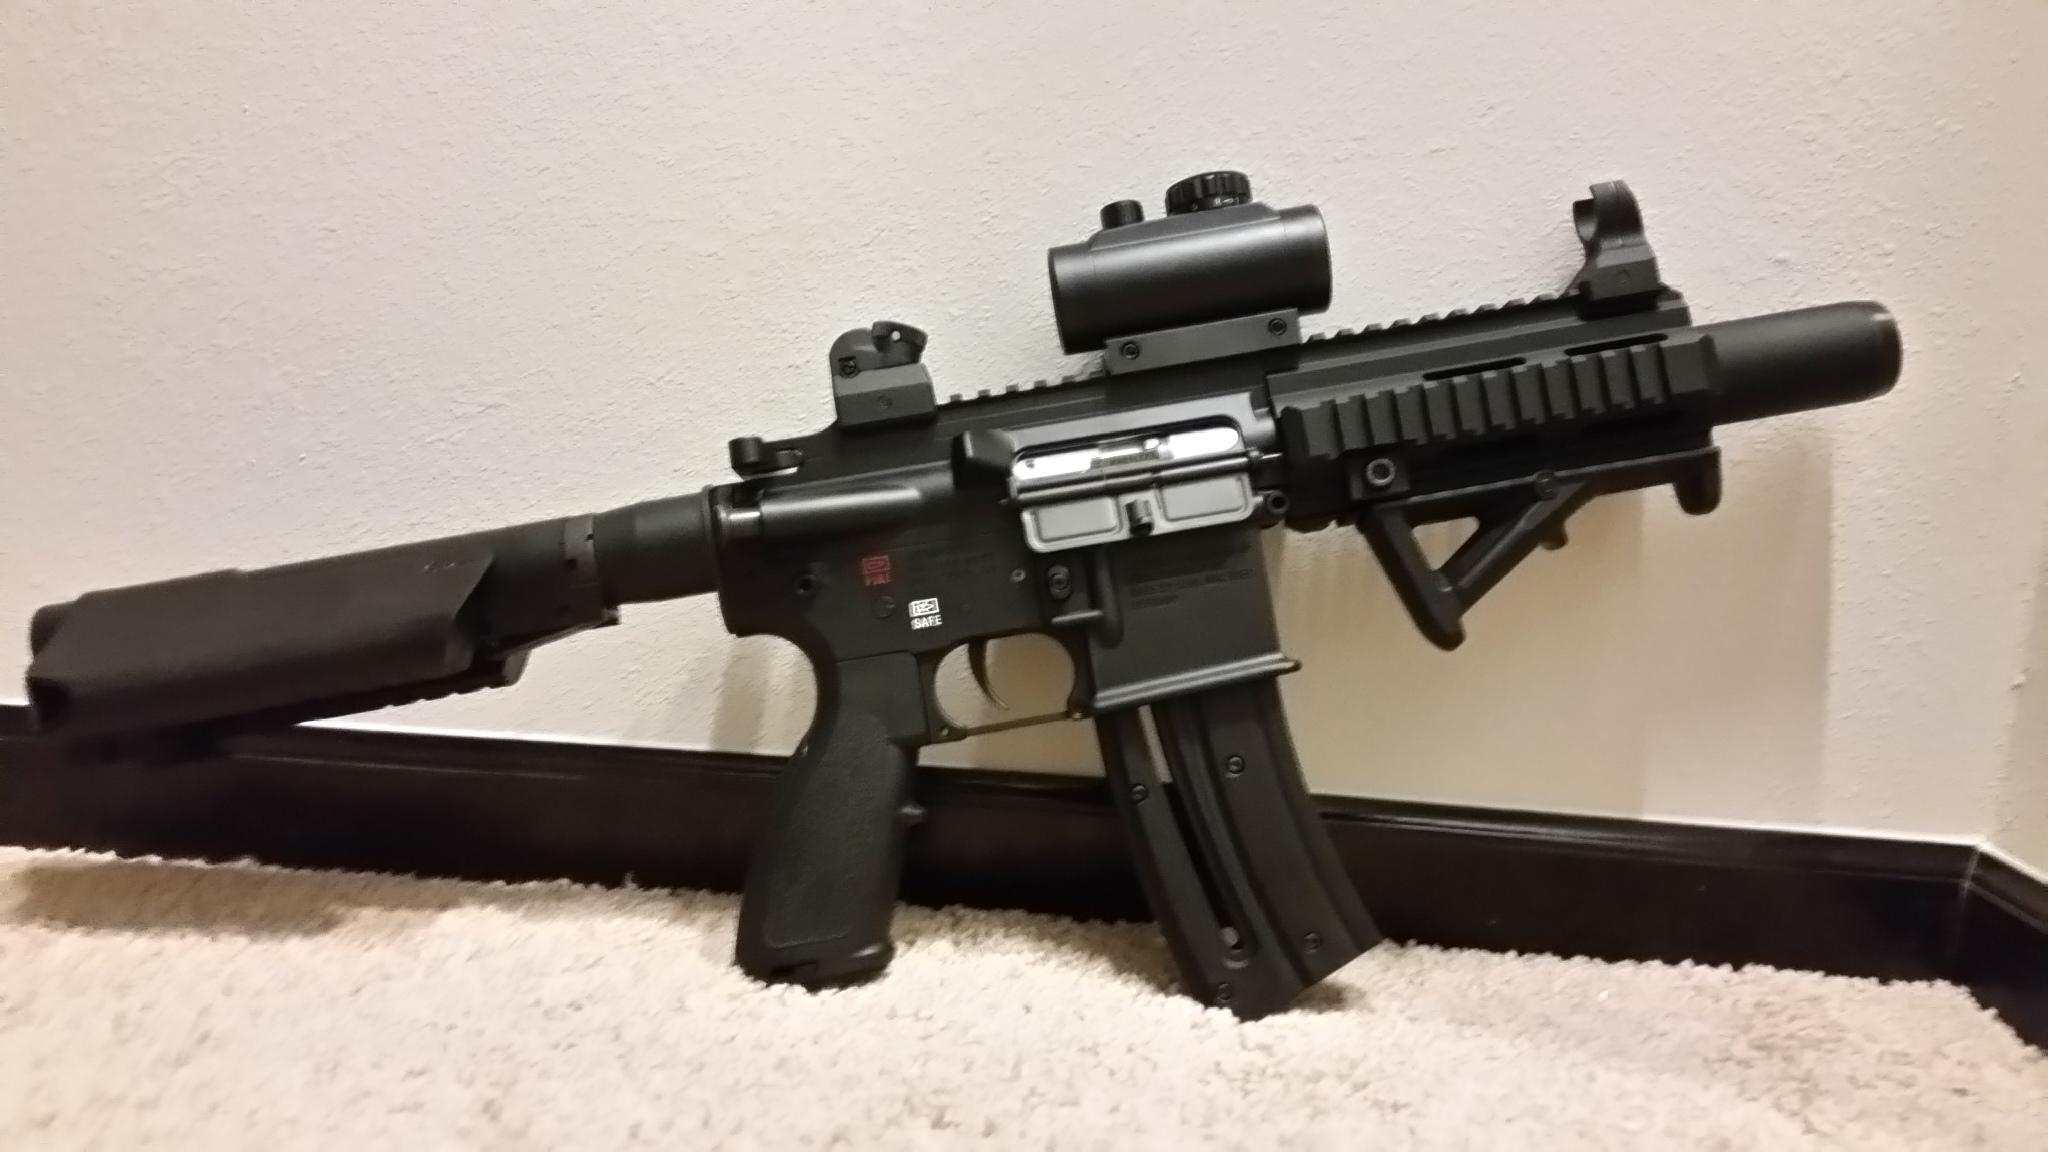 HK 416 22lr Pistol with SigTac Brace      Installation       - Page 3